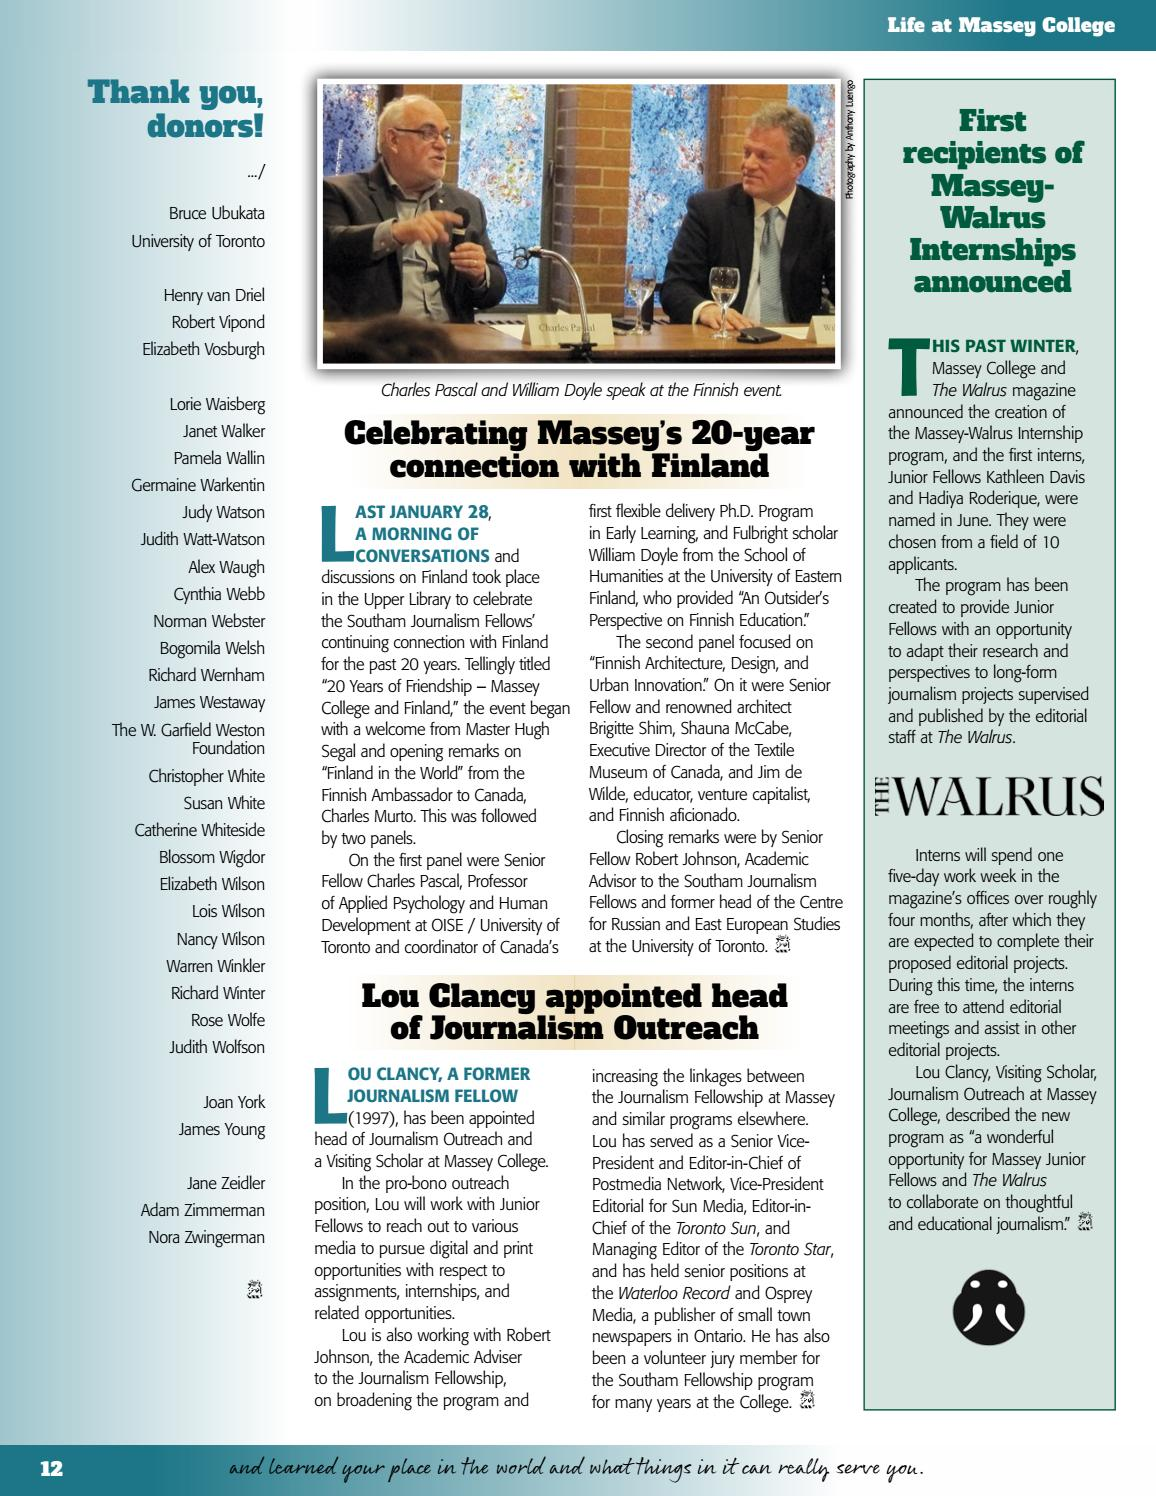 Massey News 2015-16 by Massey College - issuu